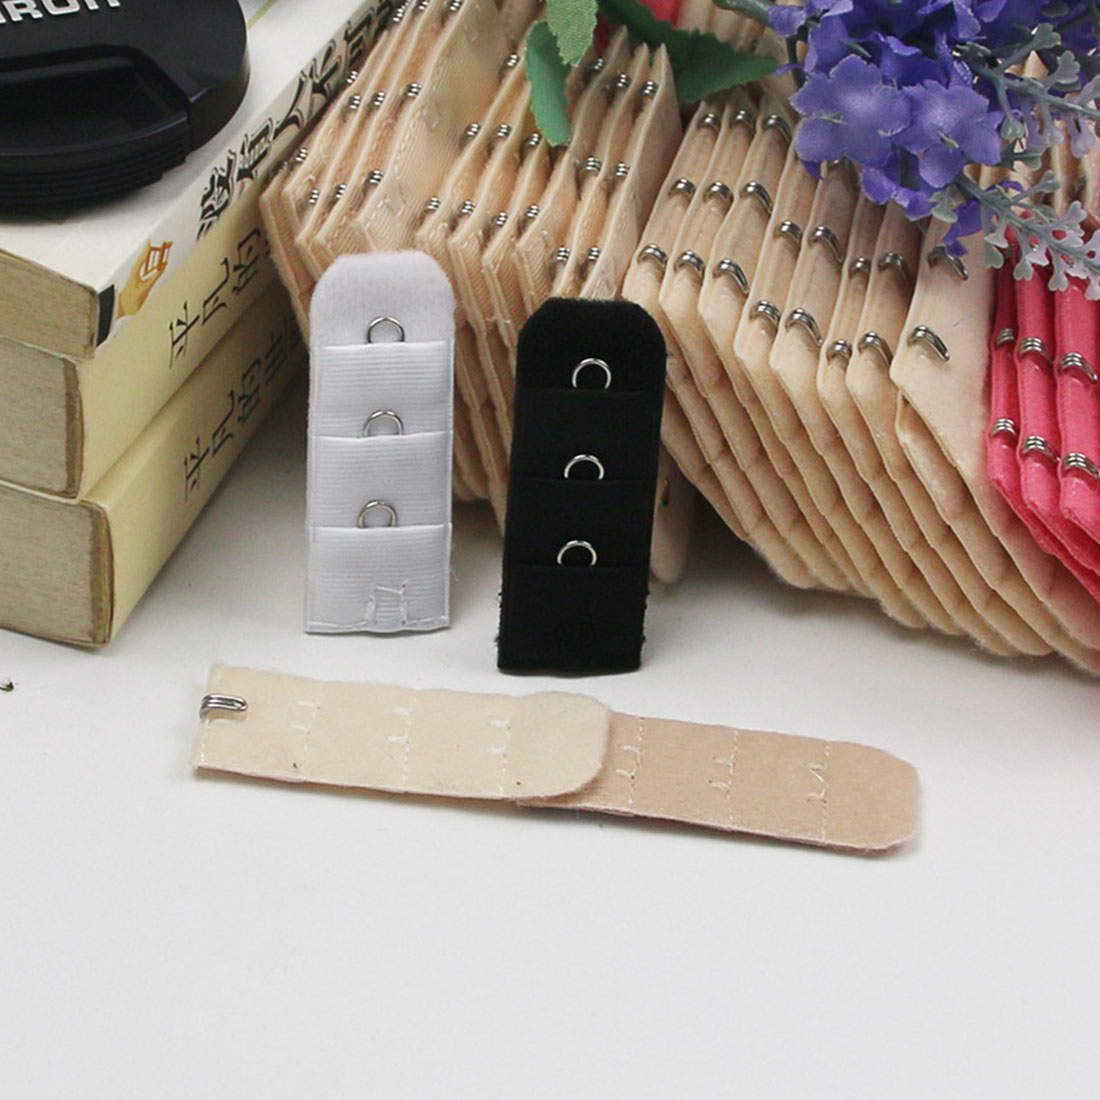 Fashiom 4pcs Bra Extender Strap Extension 1 Hooks Extenders For Women Bra Accessories Lengthened Bra Hook Botton Intimate Sexy